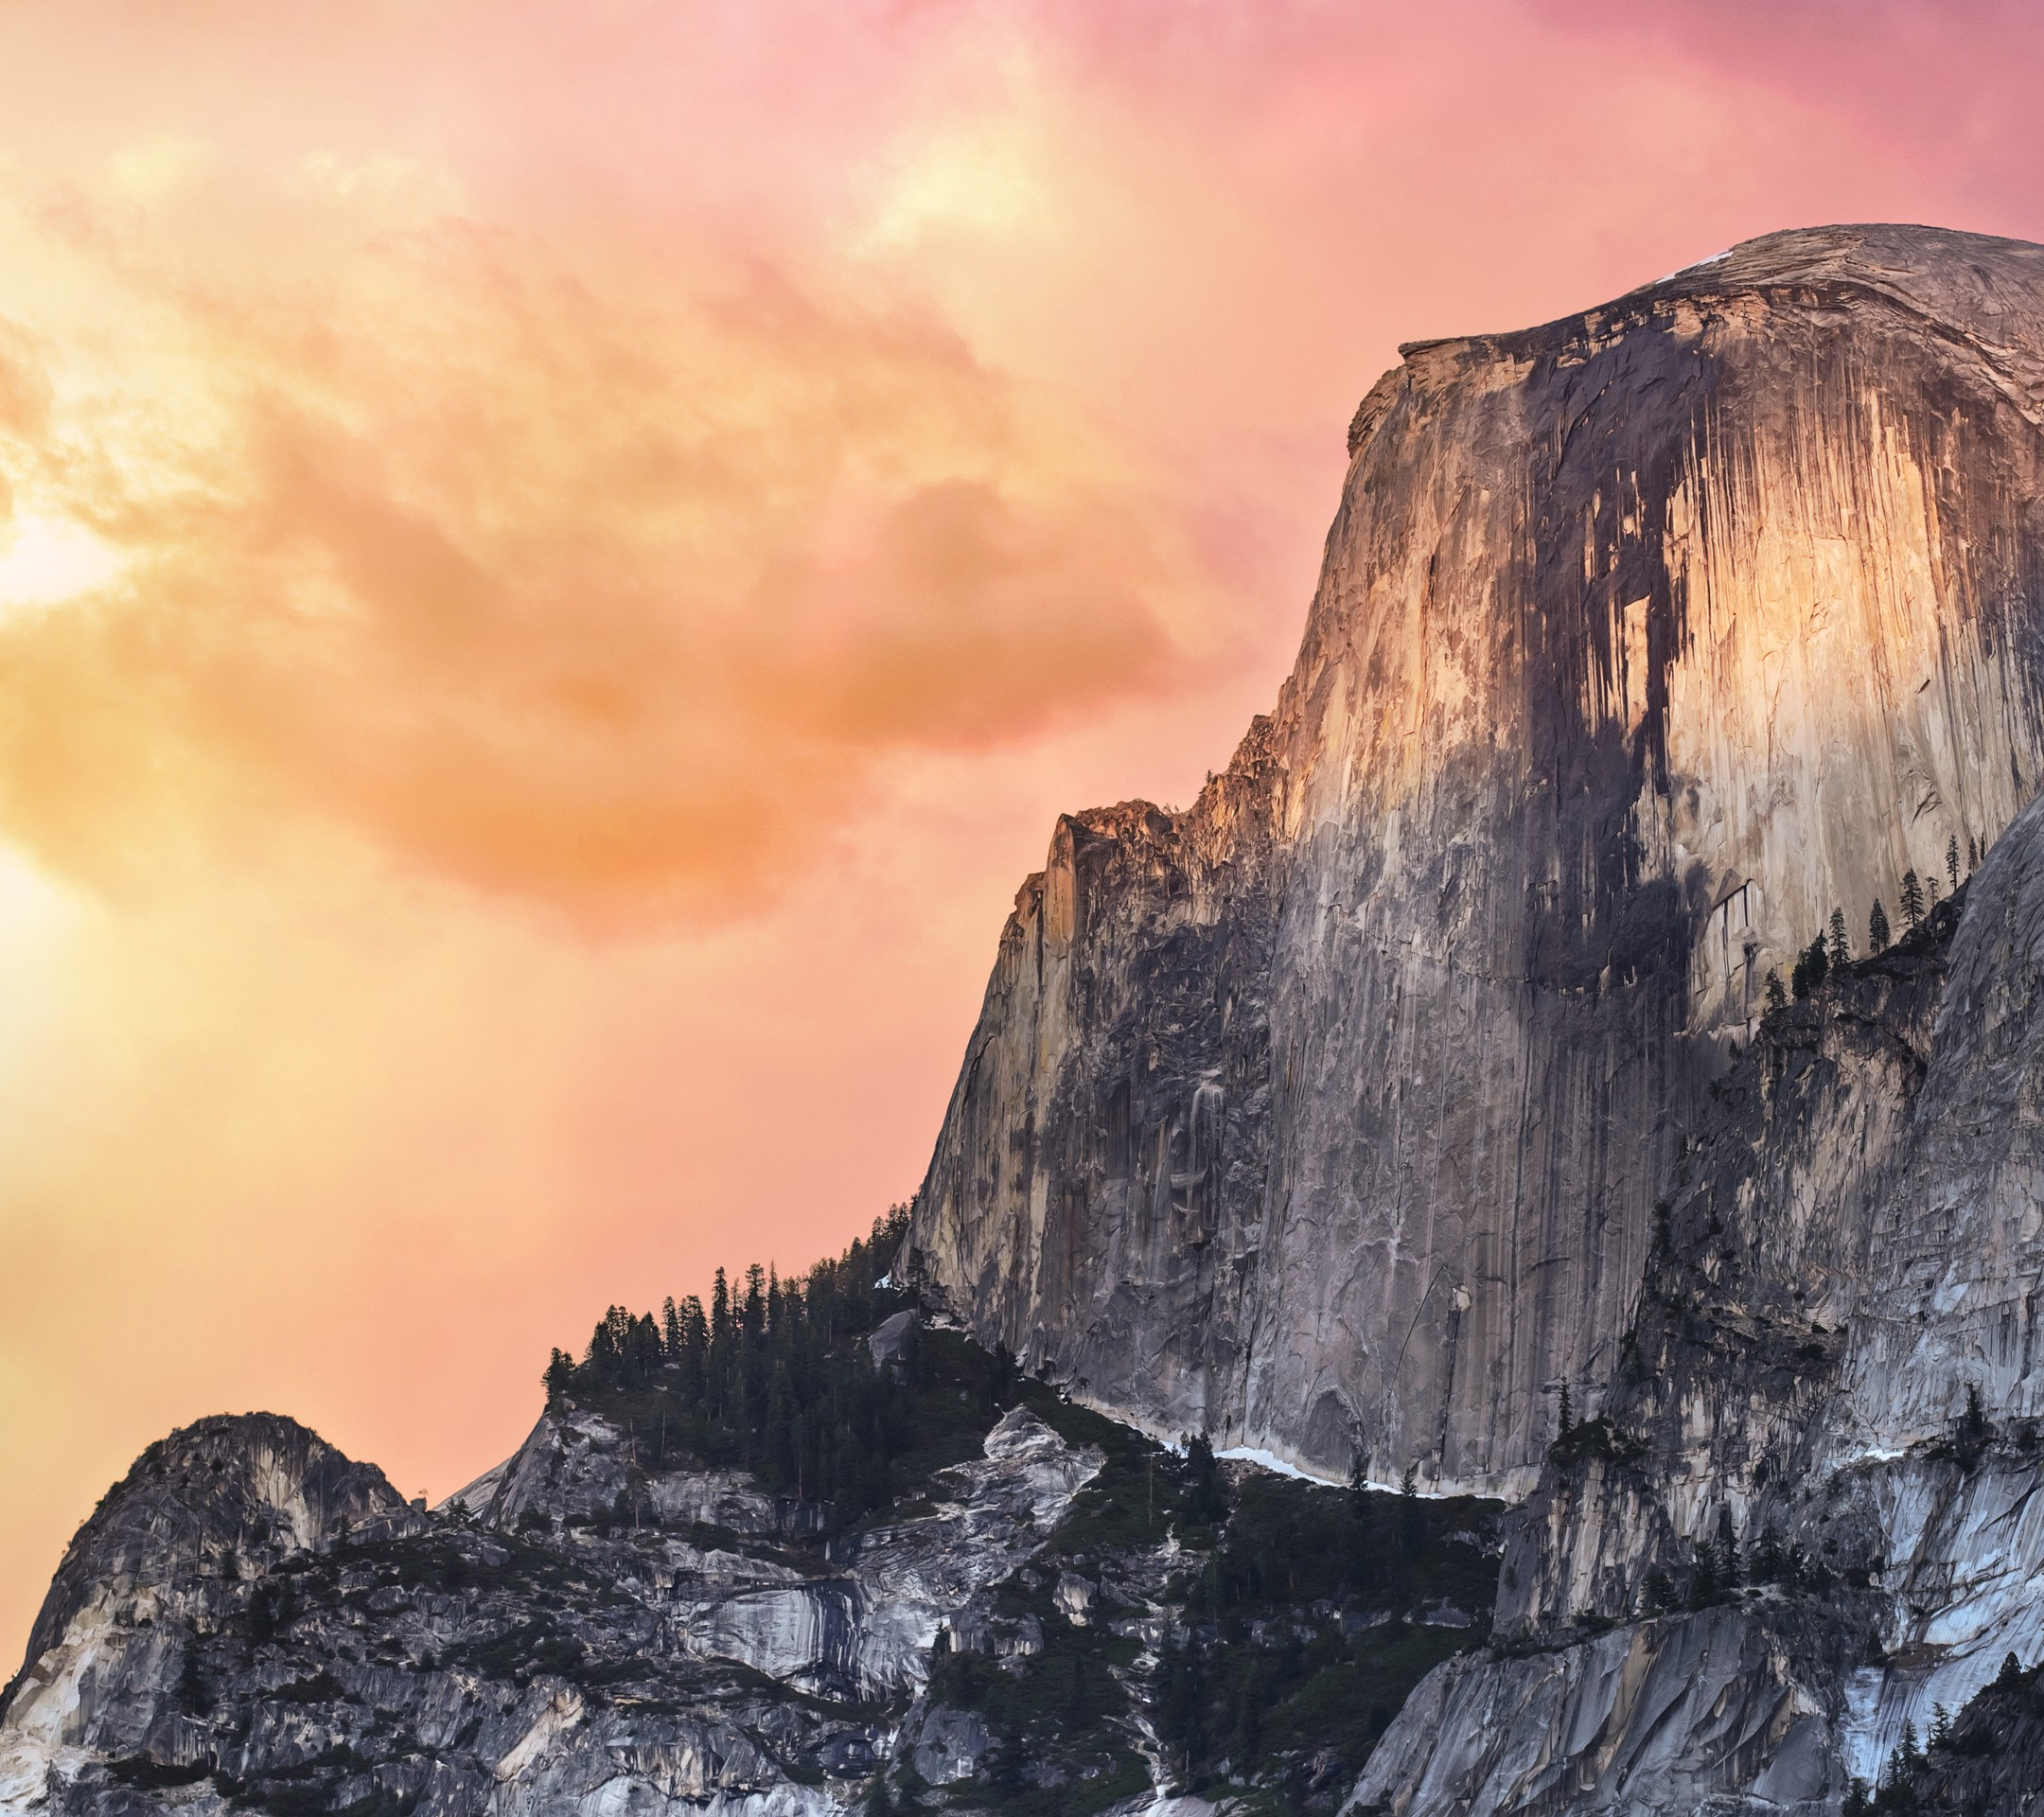 Mac OSX Yosemite Sunset Apple Desktop Wallpaper 2160x1920